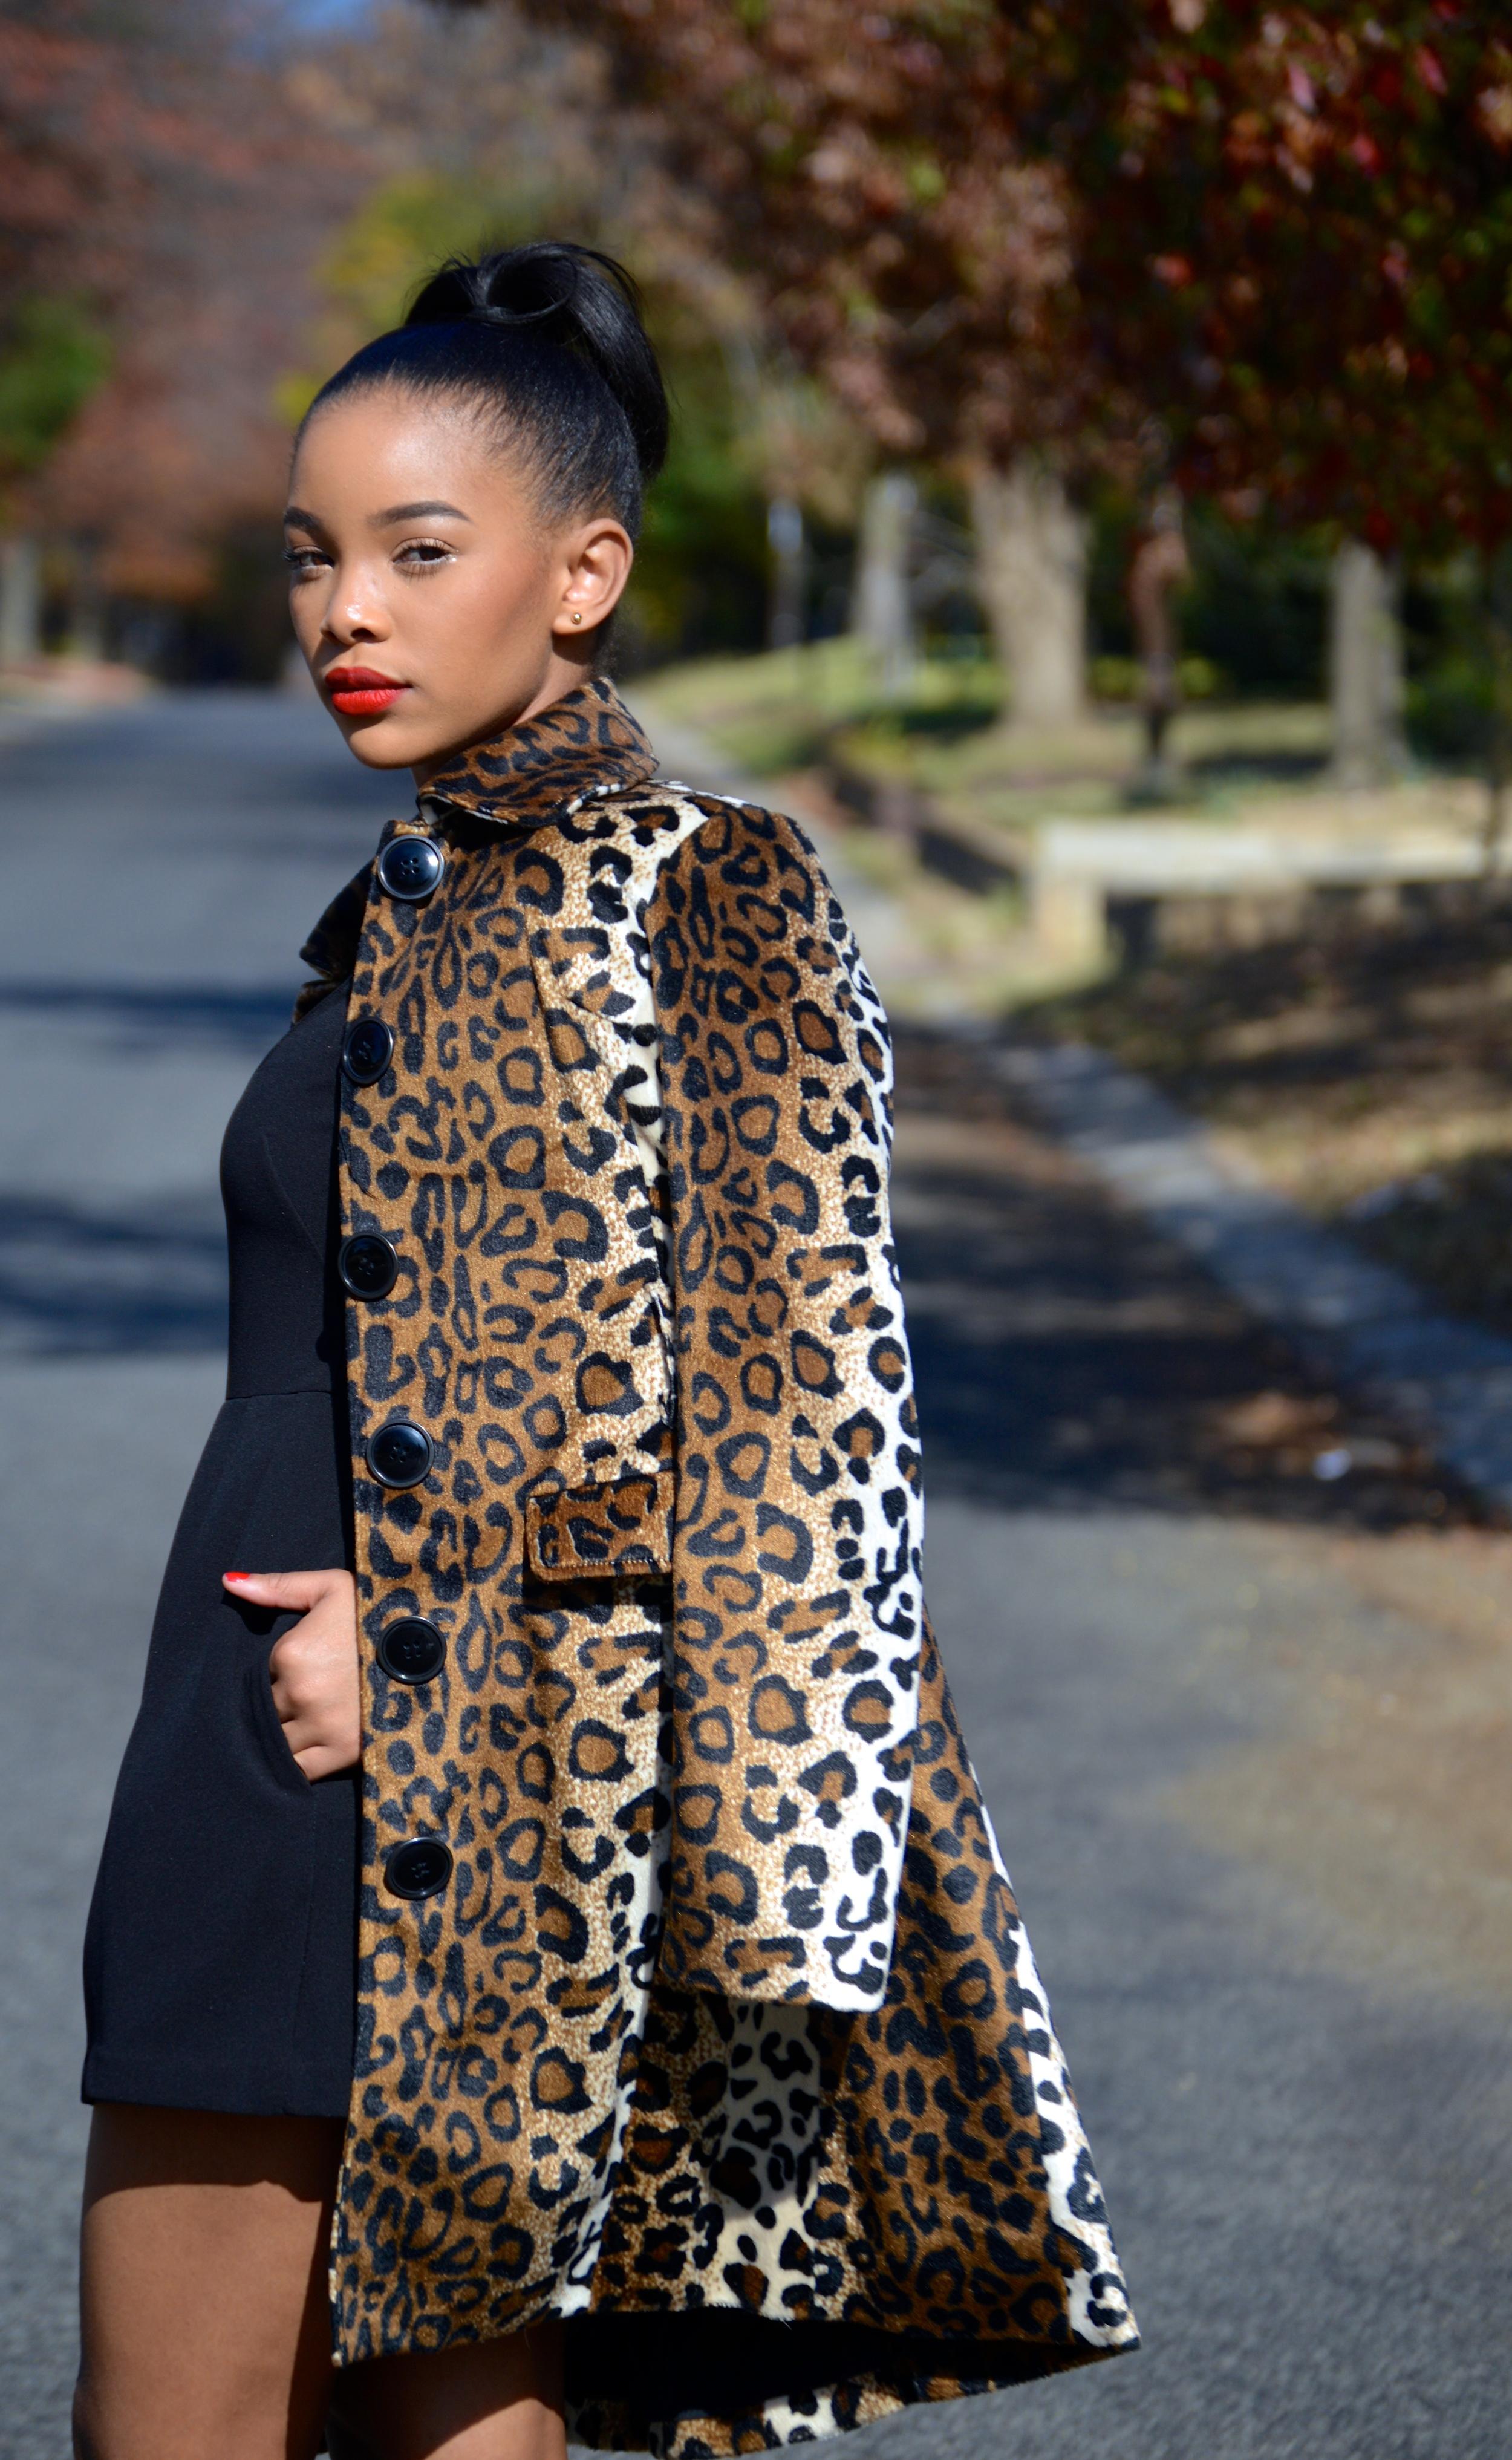 Kaylista_Leopard_01